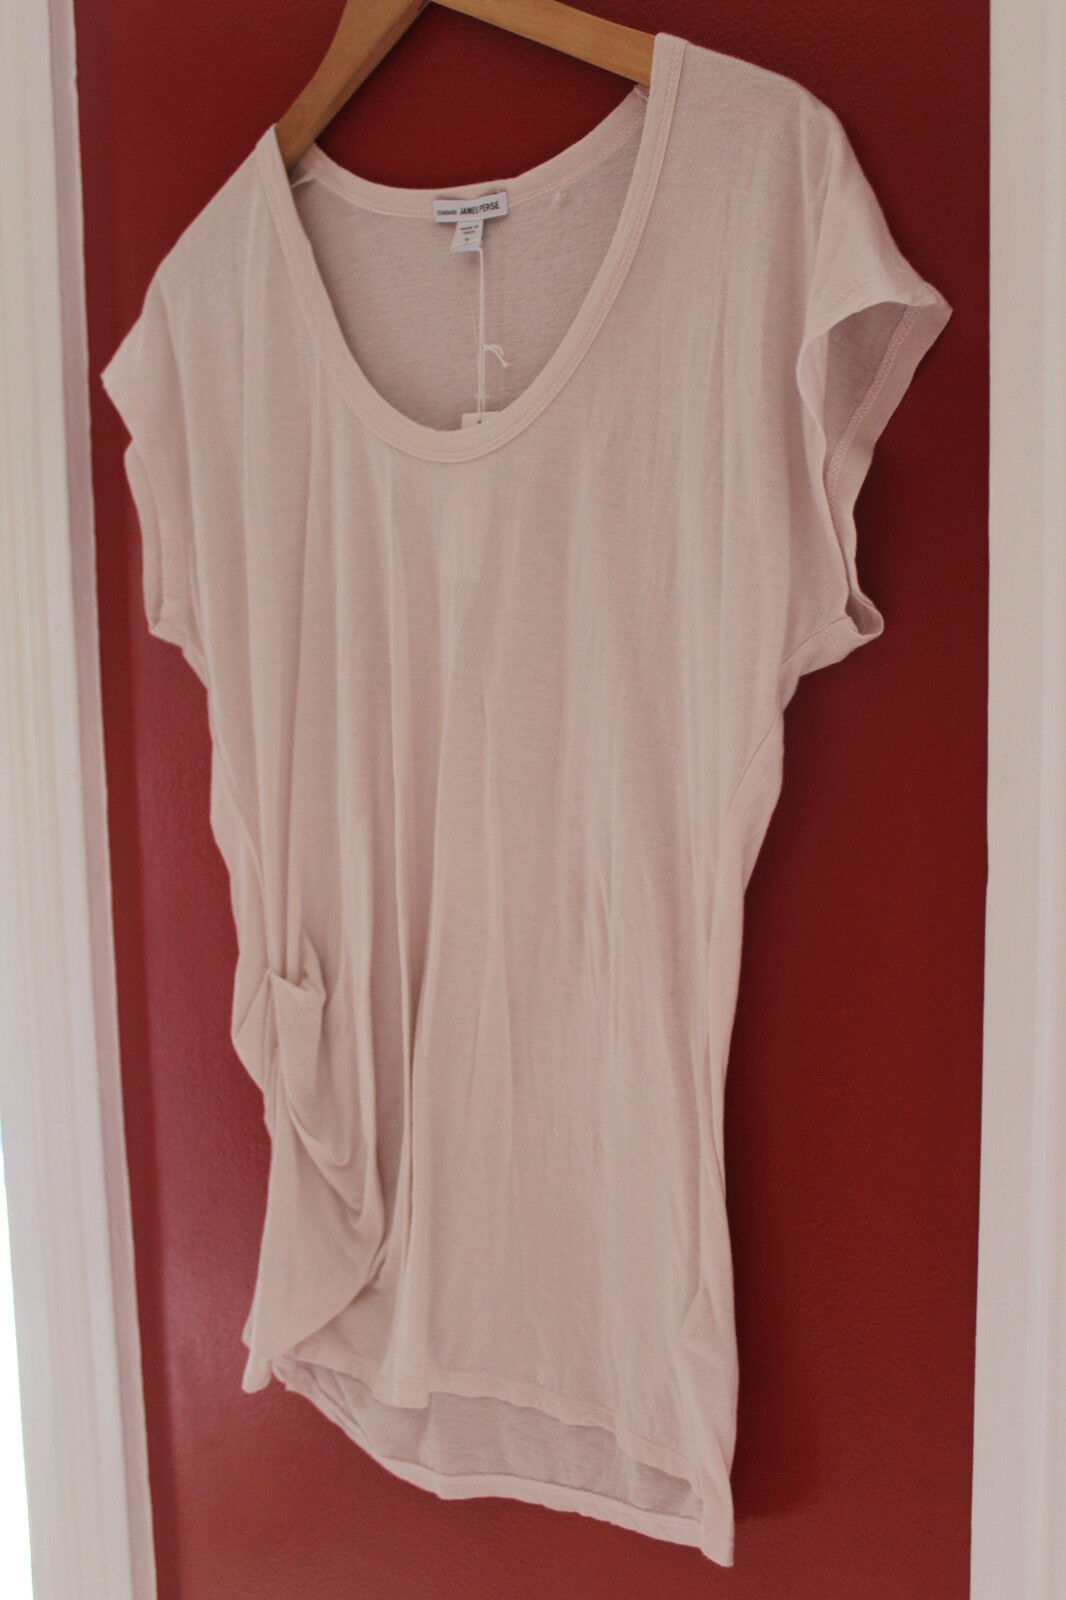 NWT Standard James Perse Designer Lt. Rosa Side Ruched Shirt Knit Top 3 L